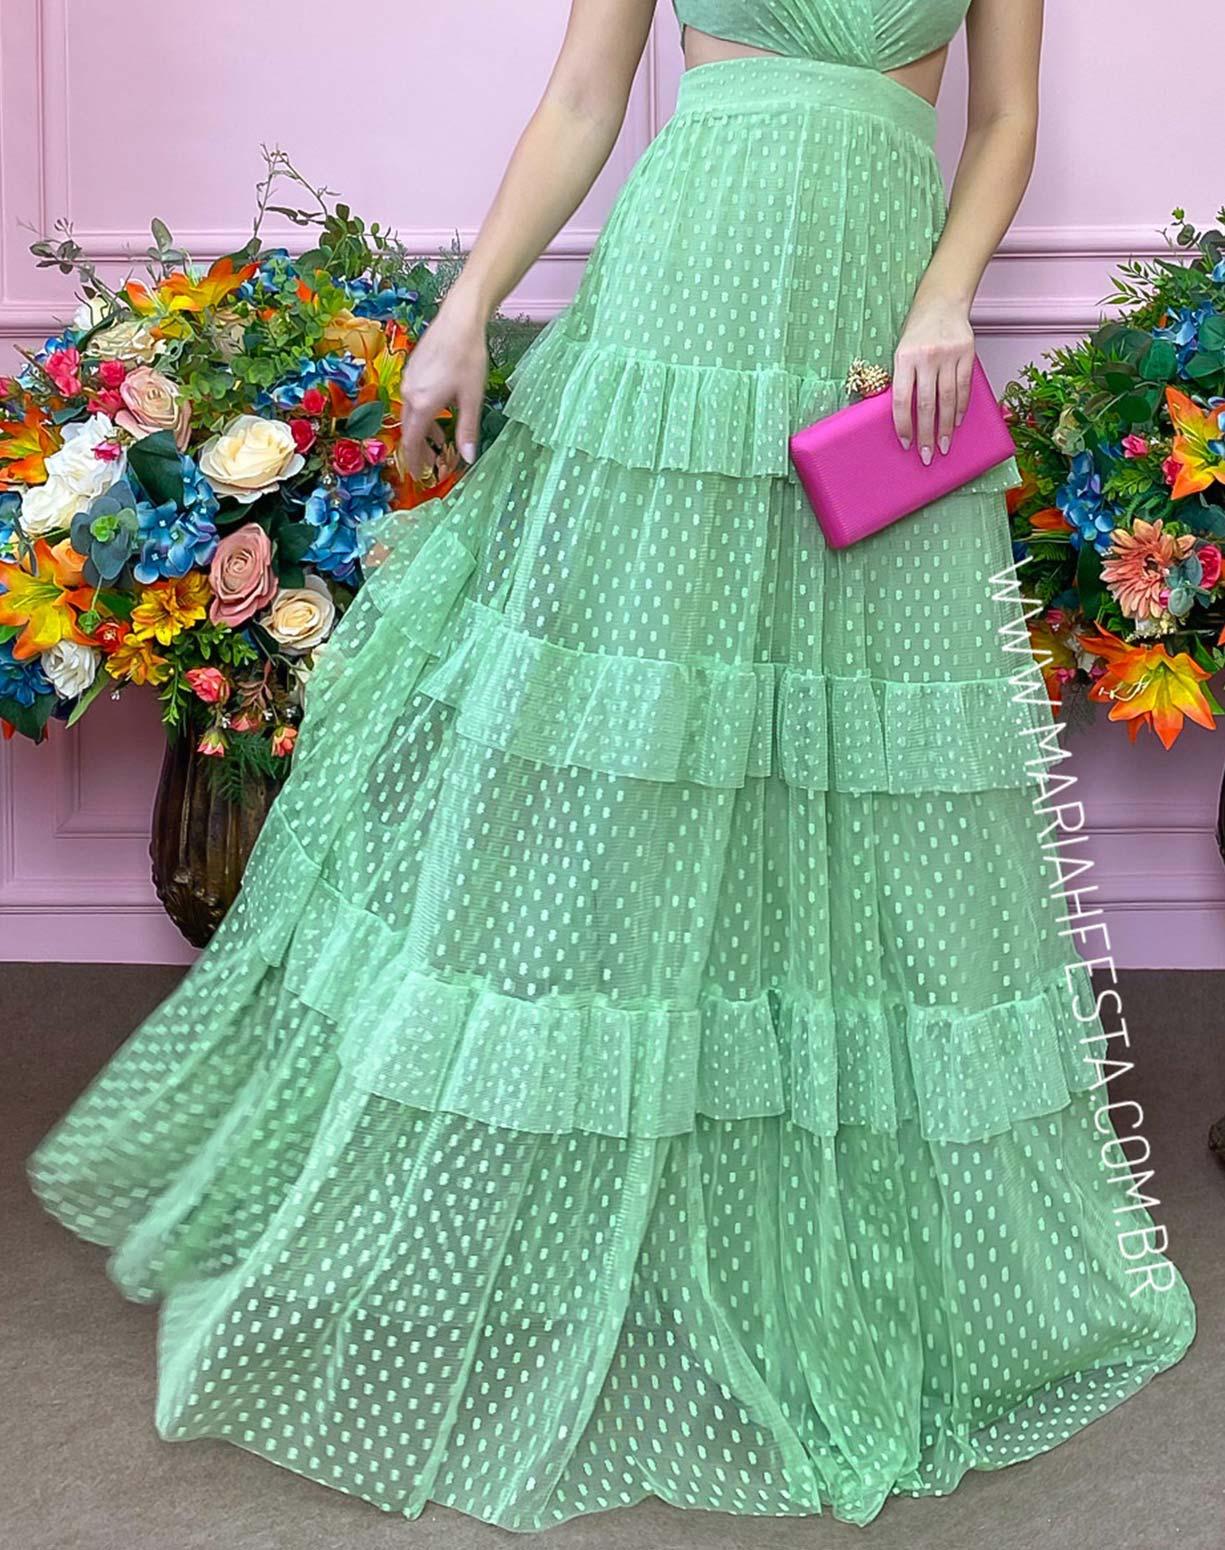 Vestido Verde Pistache em Tule Texturizado